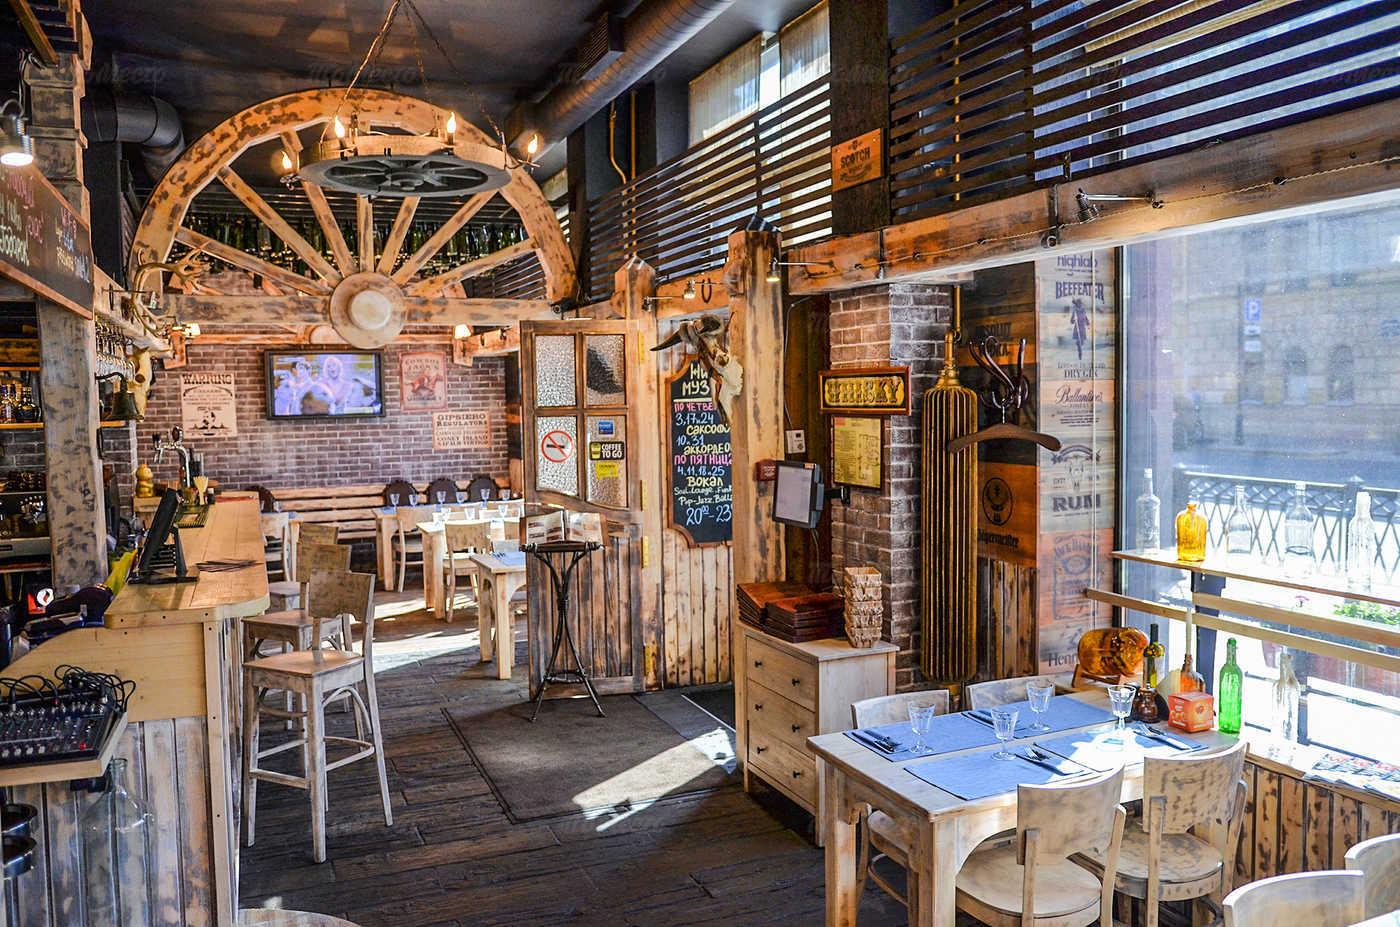 Ресторан Монтана (Montana saloon) на Кирочной улице фото 13